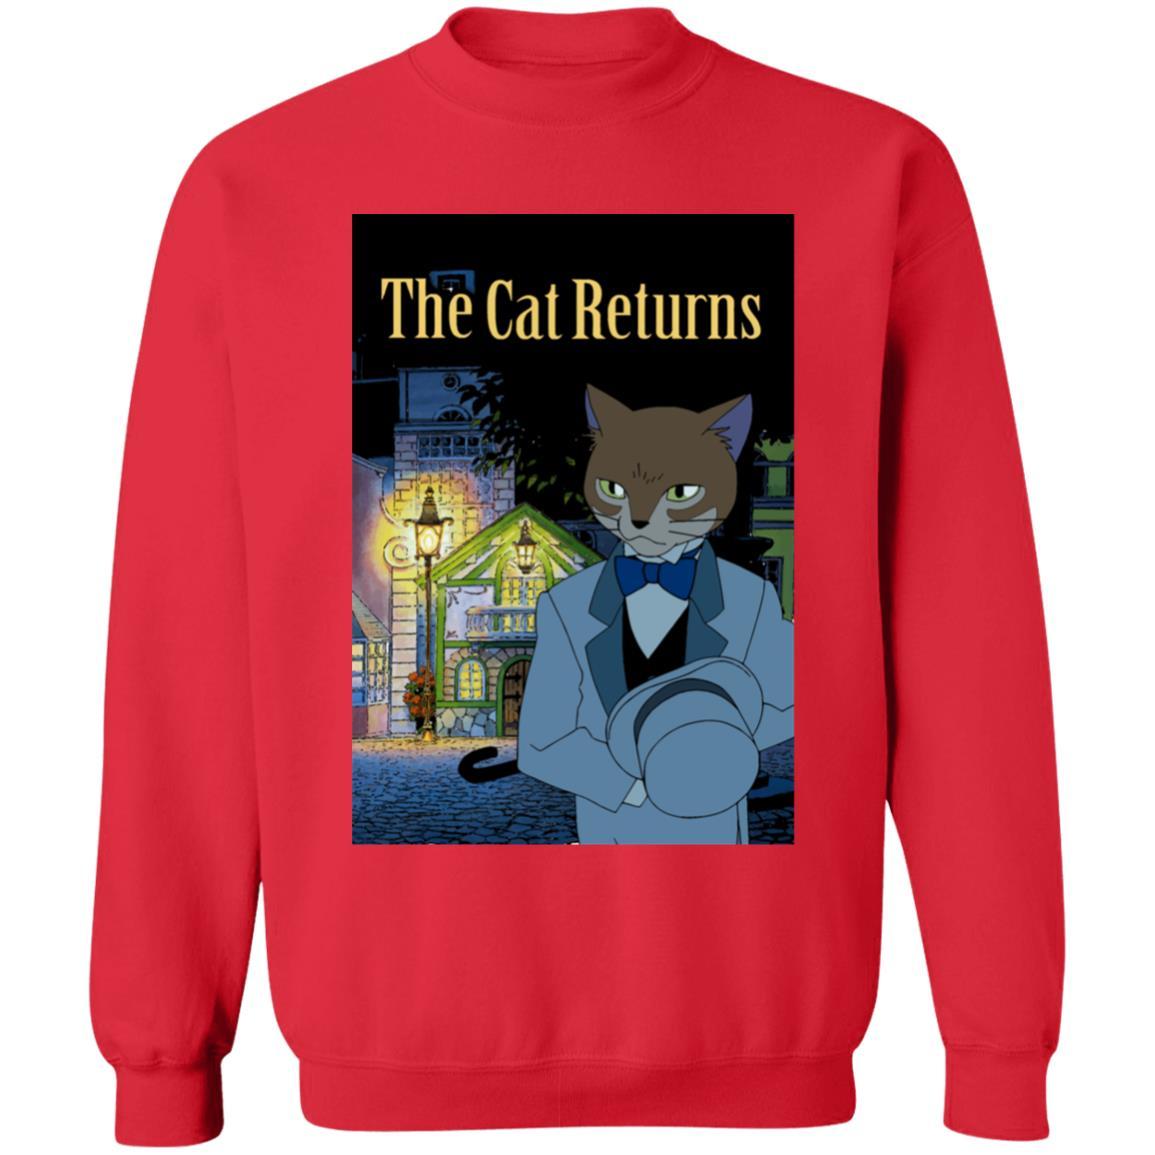 The Cat Returns Poster Sweatshirt Unisex